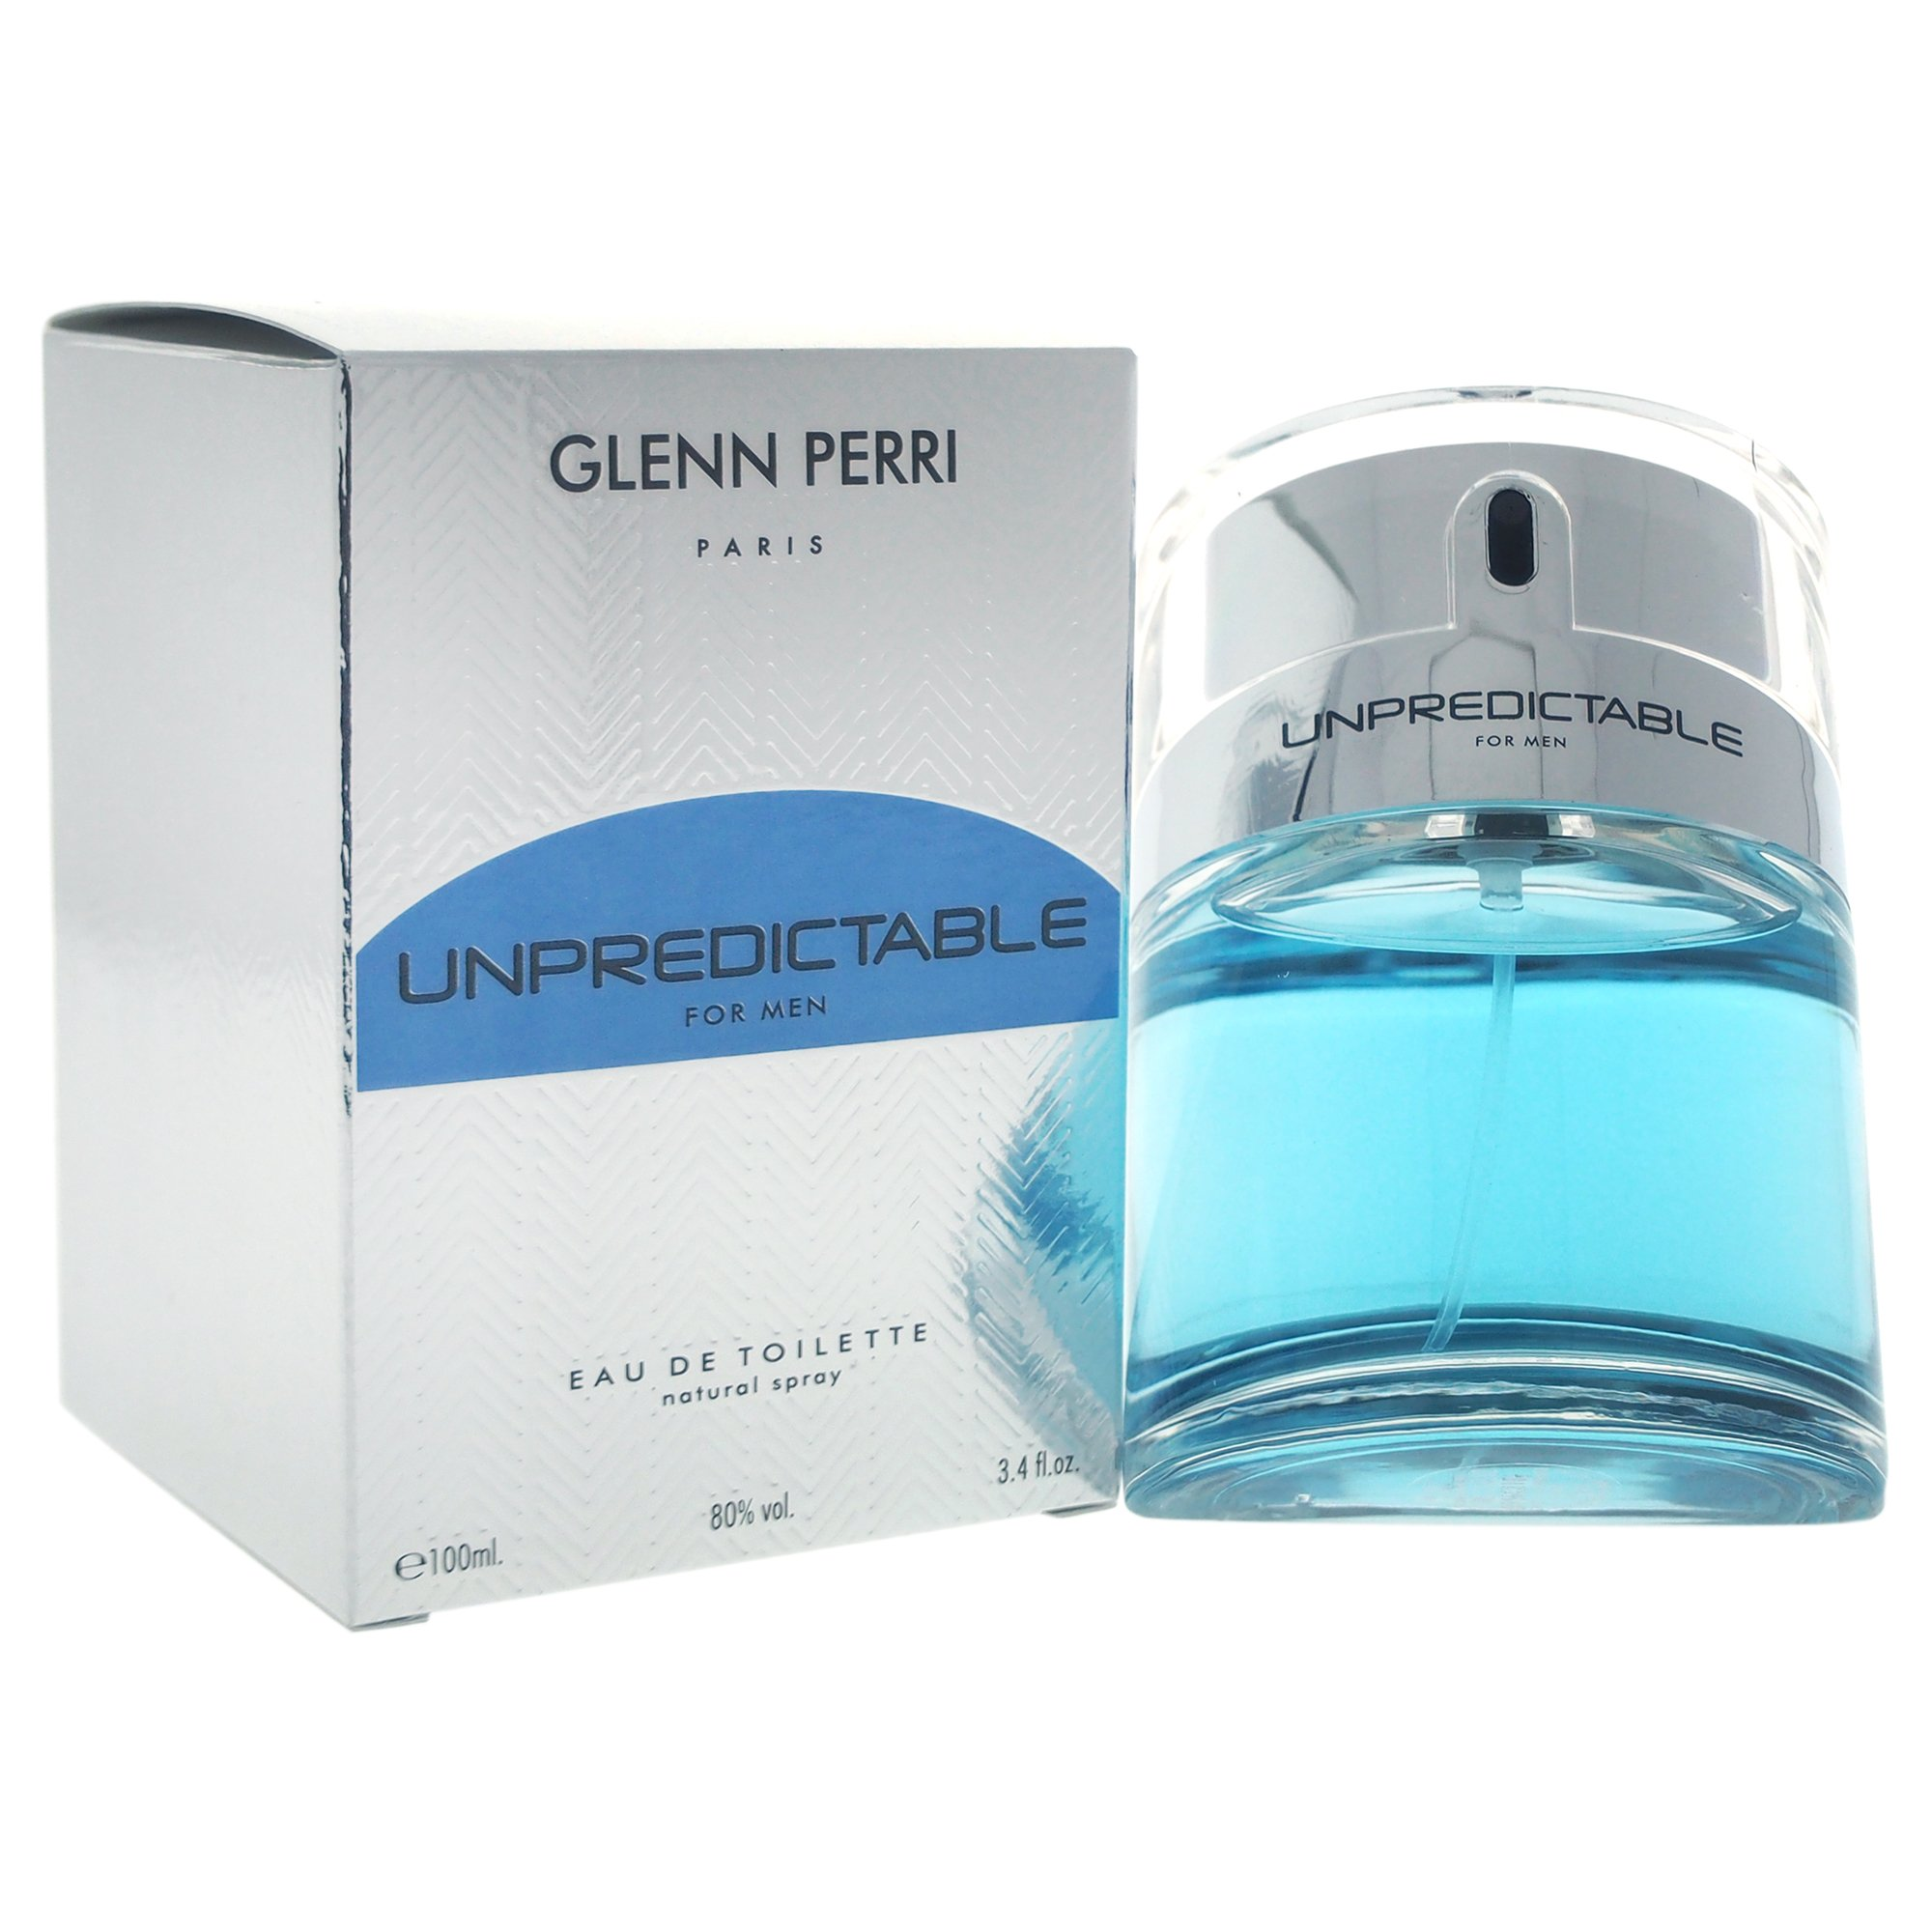 Glenn Perri Unpredictable Eau De Toilette Spray for Men, 3.4 Ounce